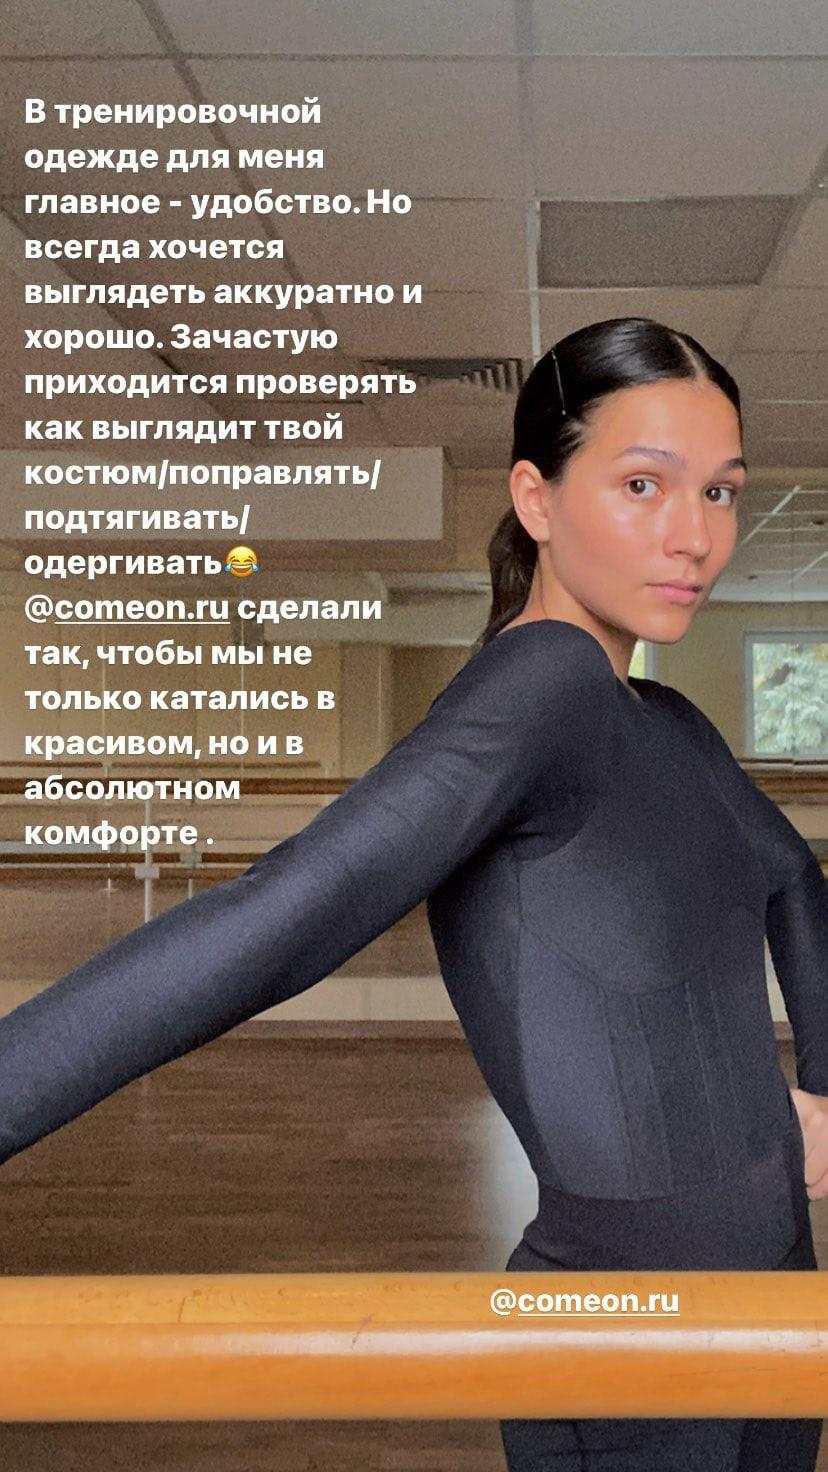 https://i4.imageban.ru/out/2021/08/07/3e5da8e0cf884f051bff29e6856075de.jpg